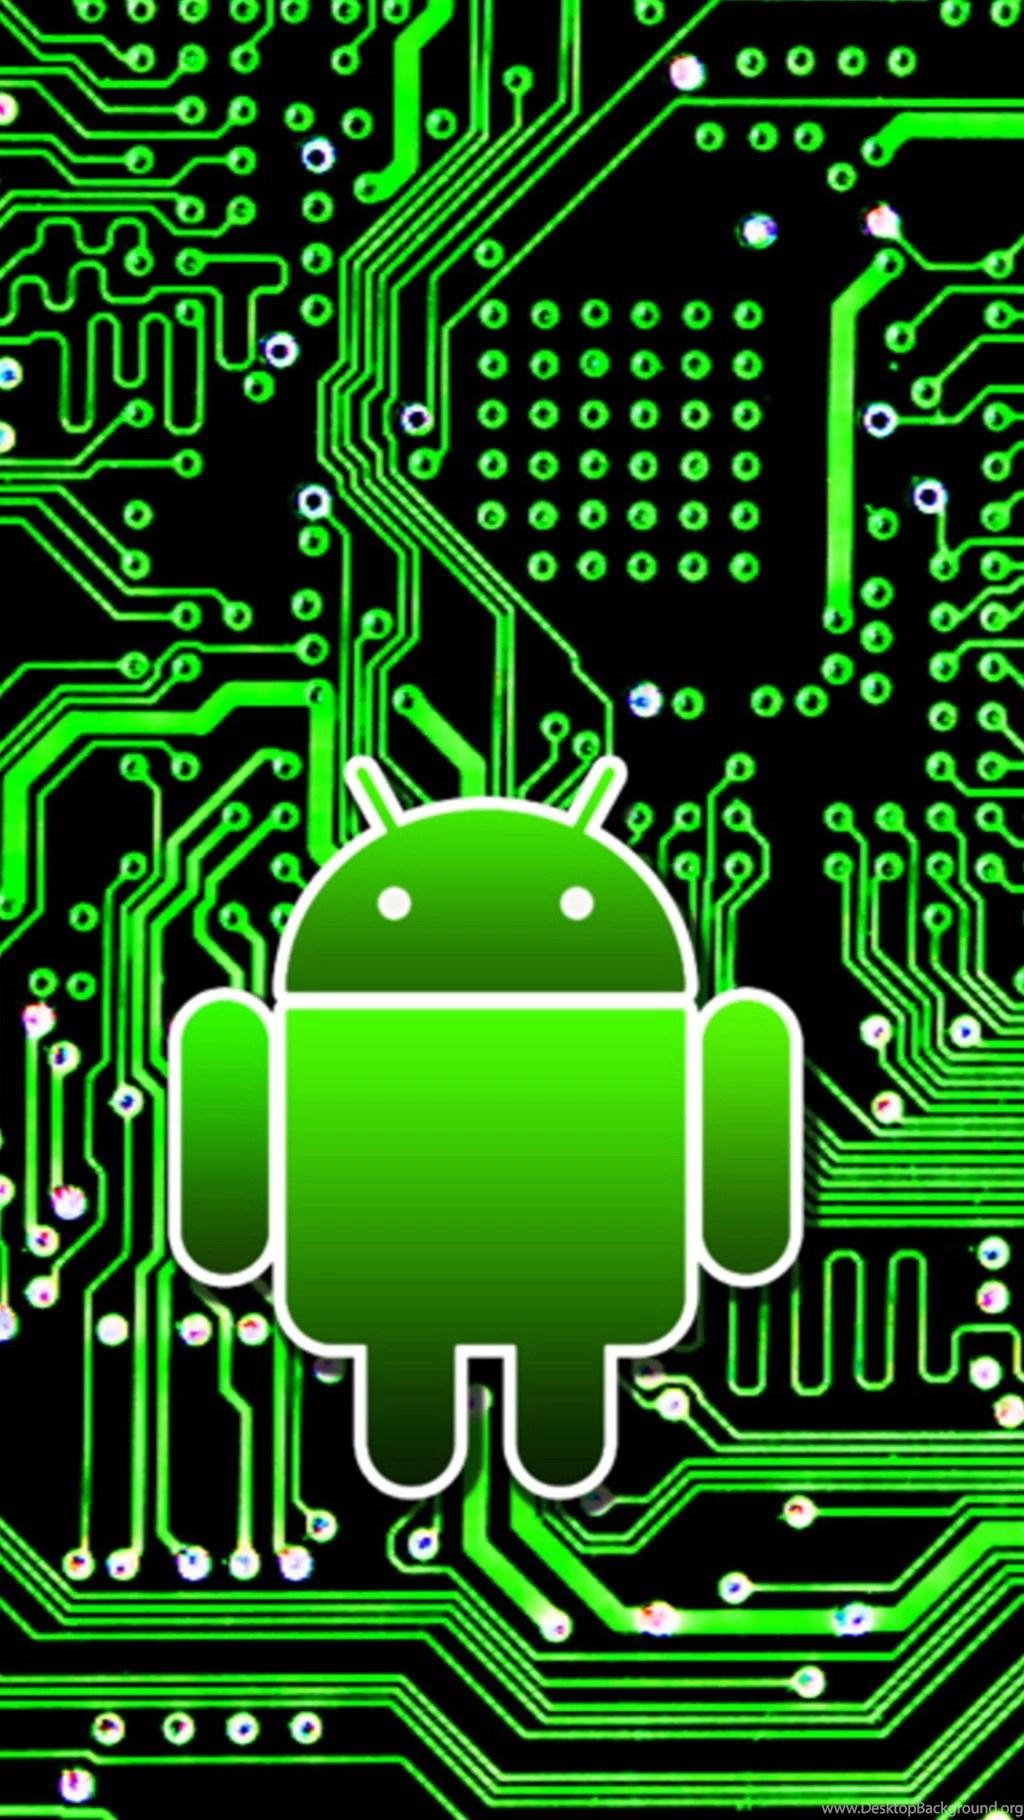 Dark Blue Iphone Wallpaper Android Circuit Board 01 Galaxy S5 Wallpapers Hd Jpg